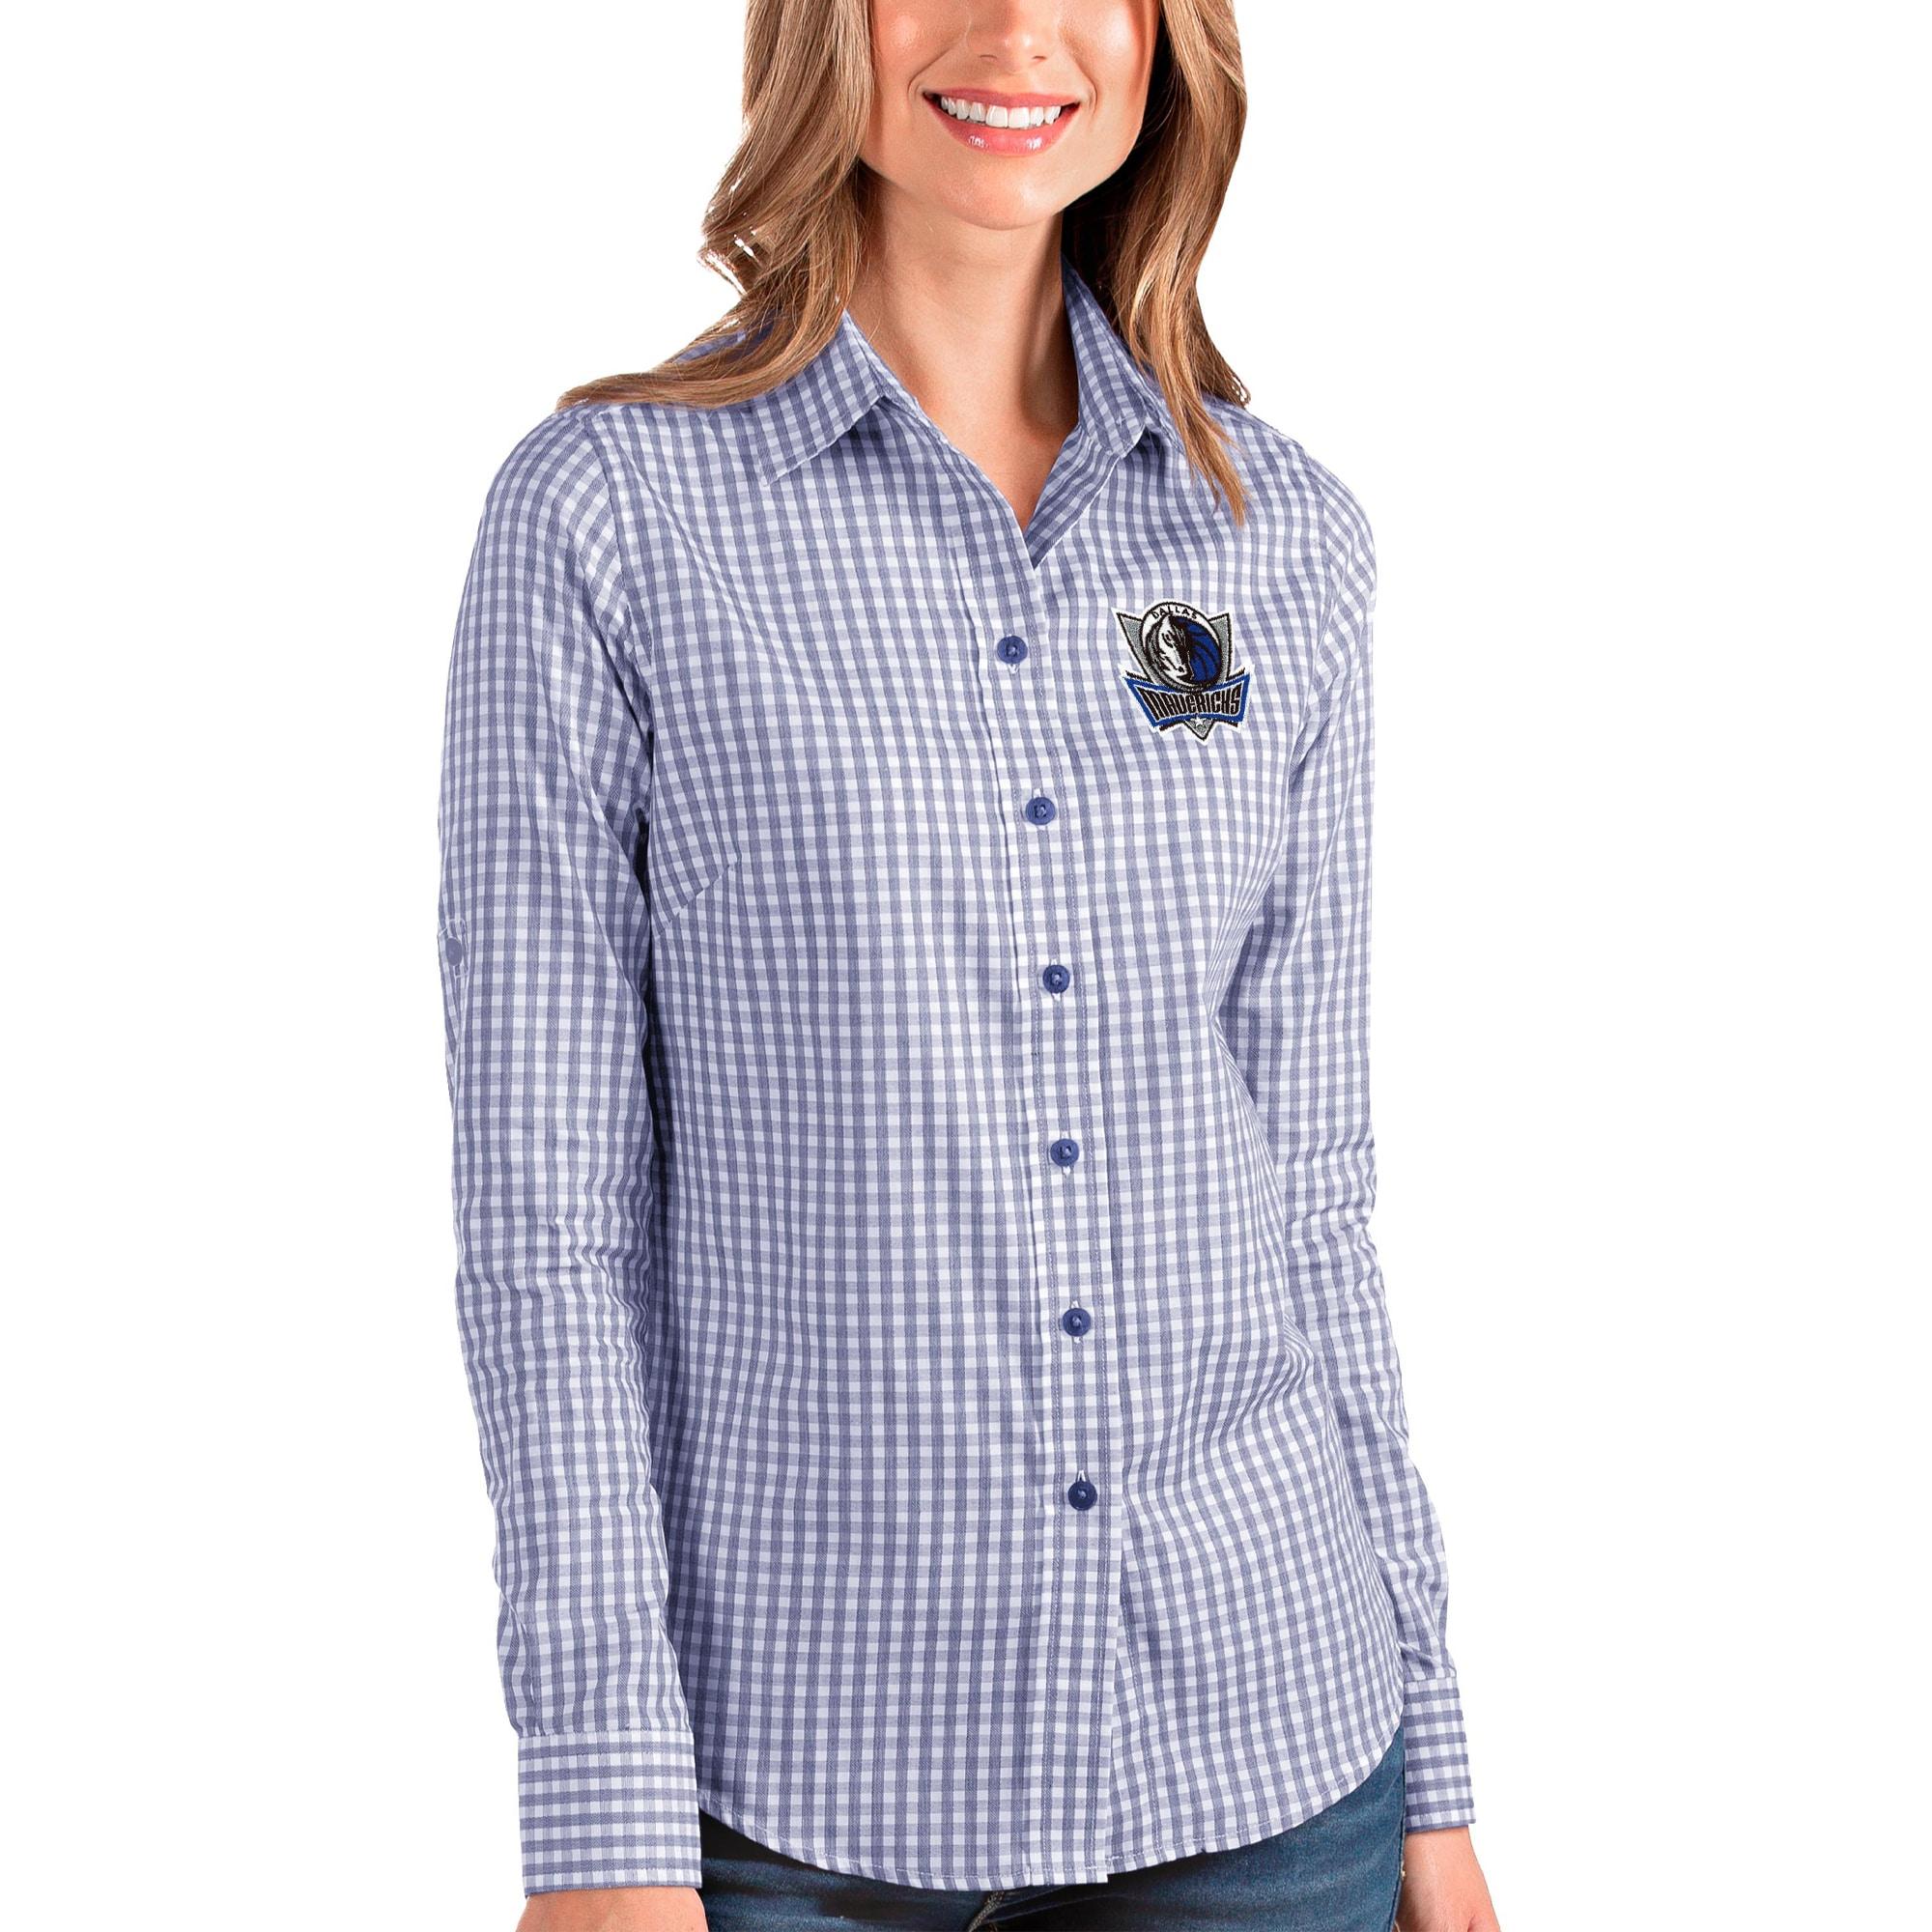 Dallas Mavericks Antigua Women's Structure Button-Up Long Sleeve Shirt - Royal/White